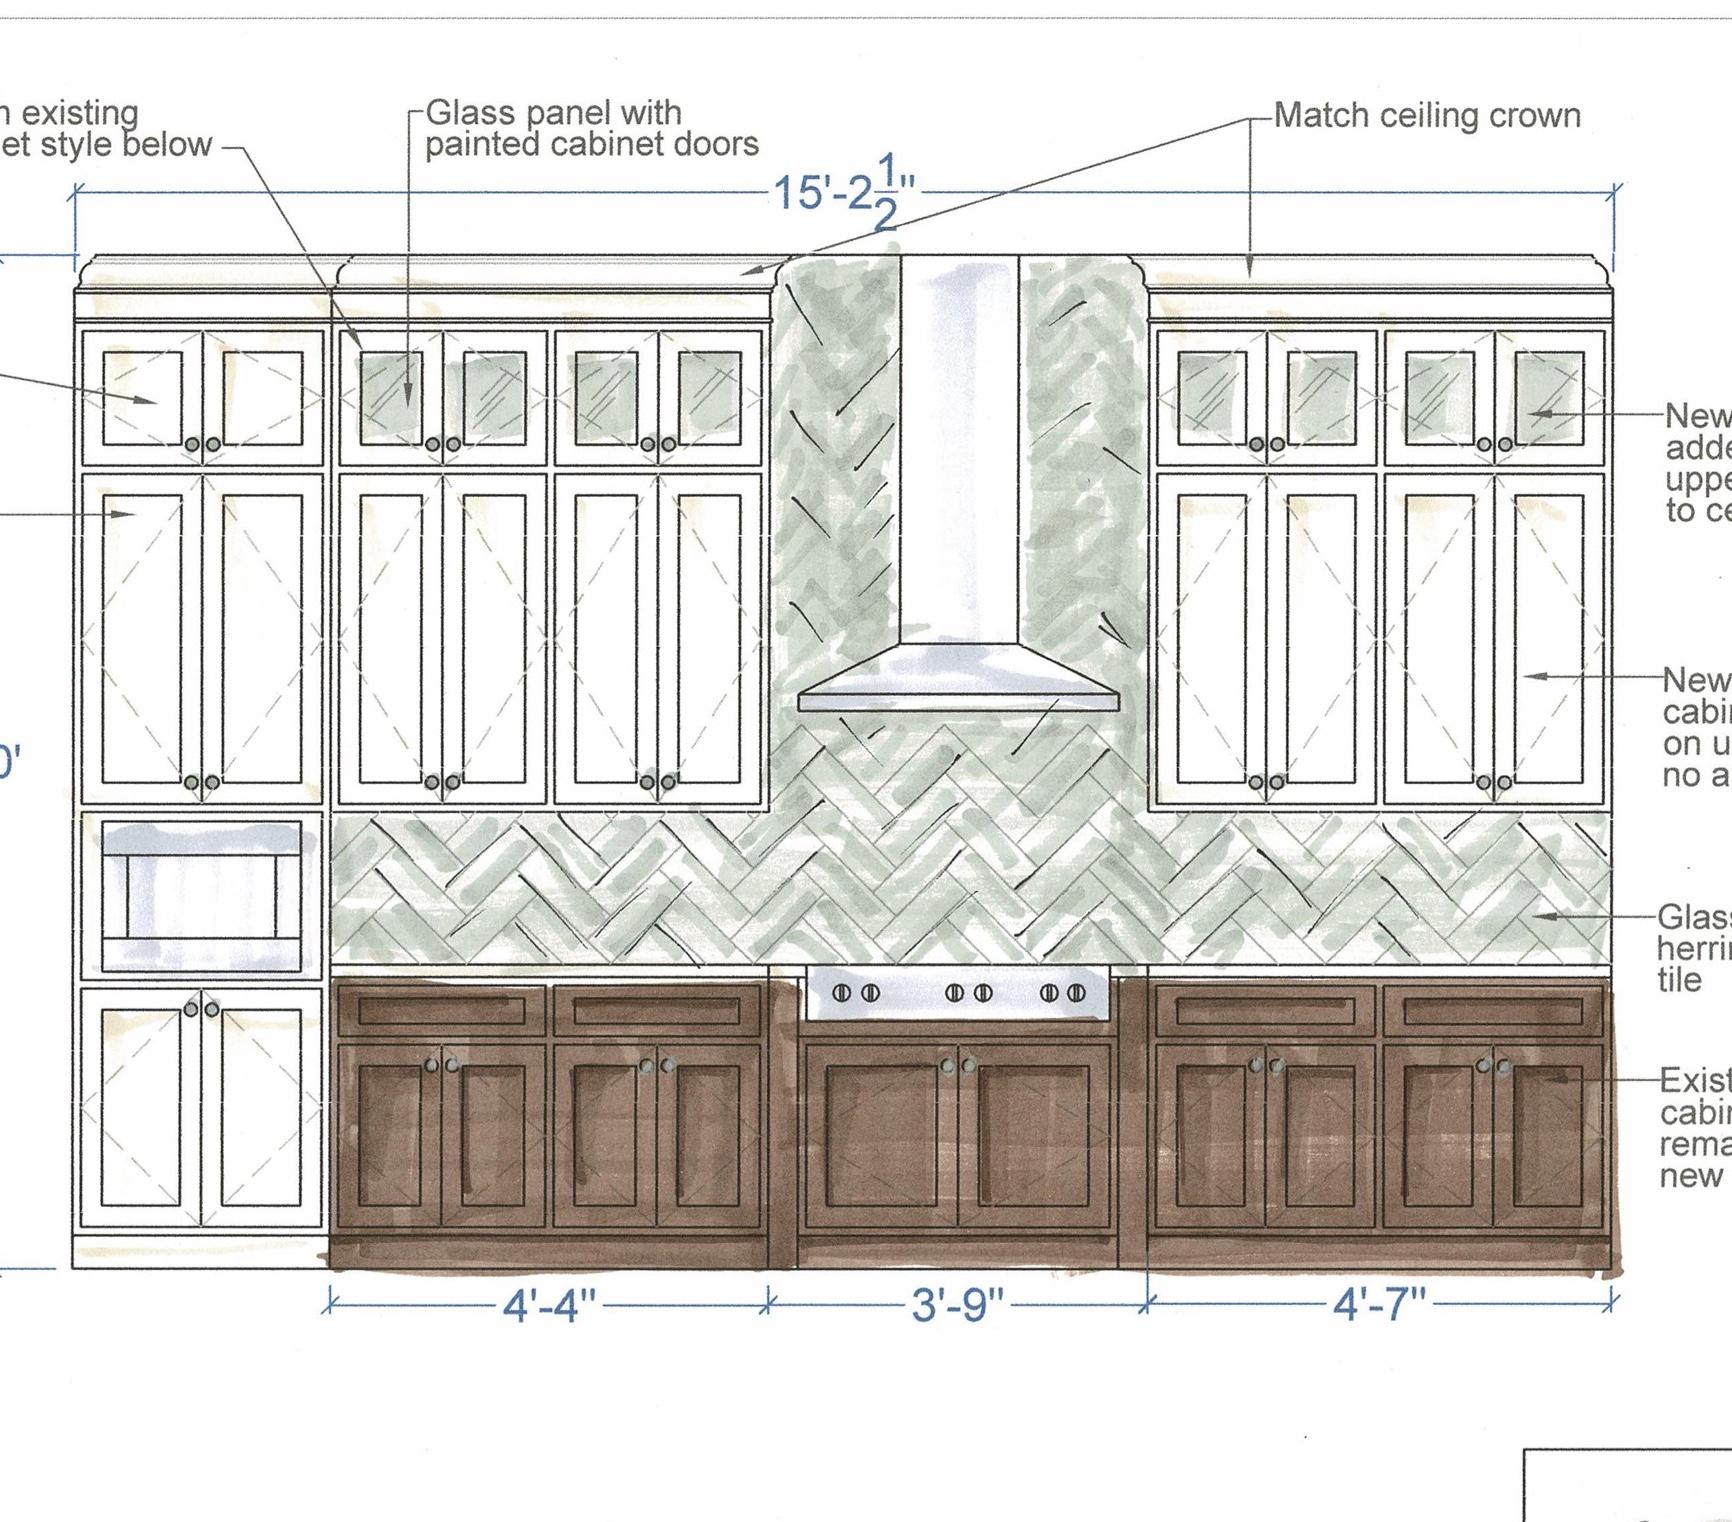 Elevation drawing of kitchen remodel design